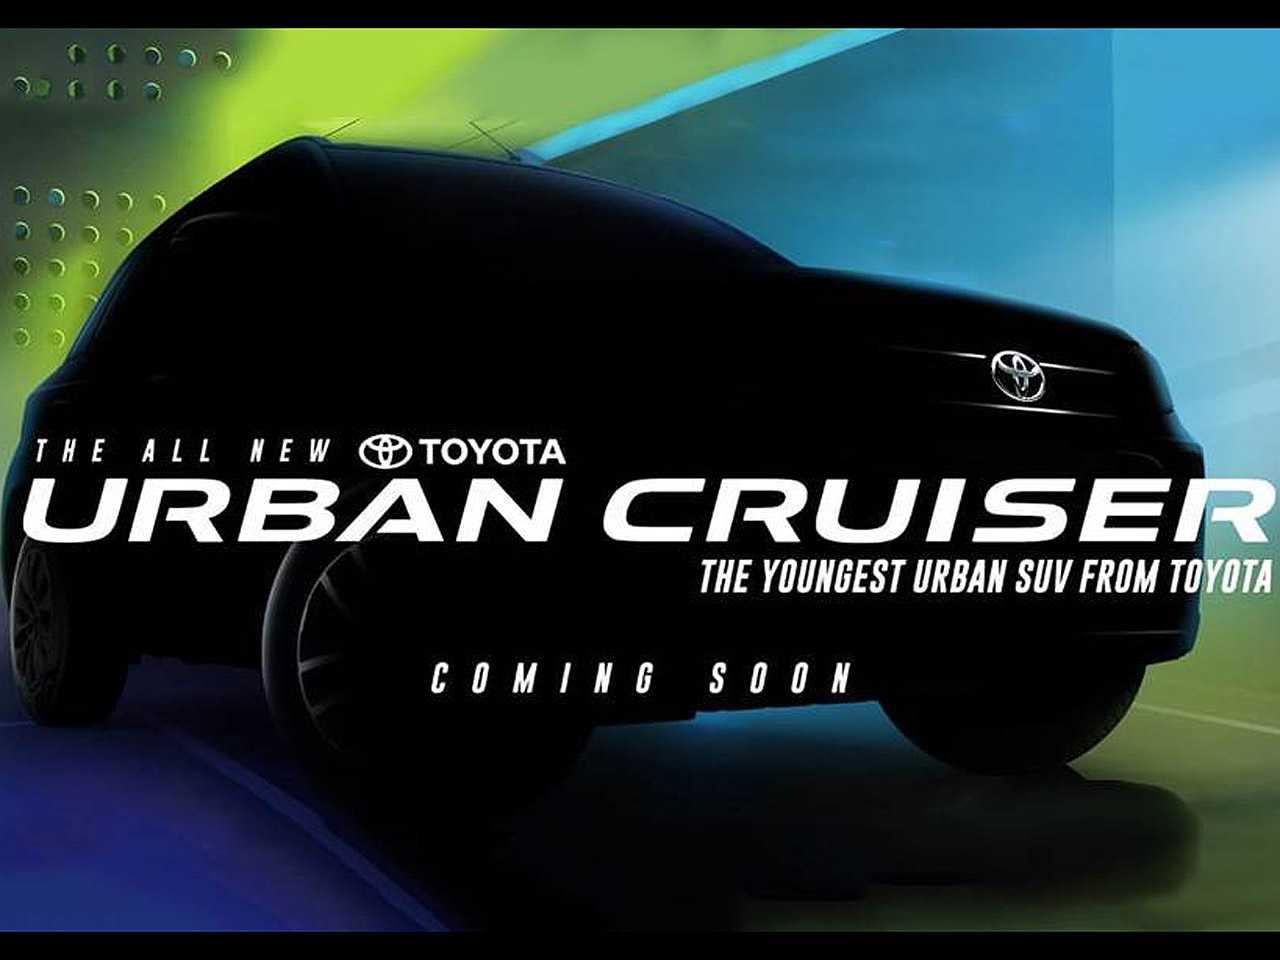 Suzuki Vitara torna-se Toyota Urban Cruiser na Índia